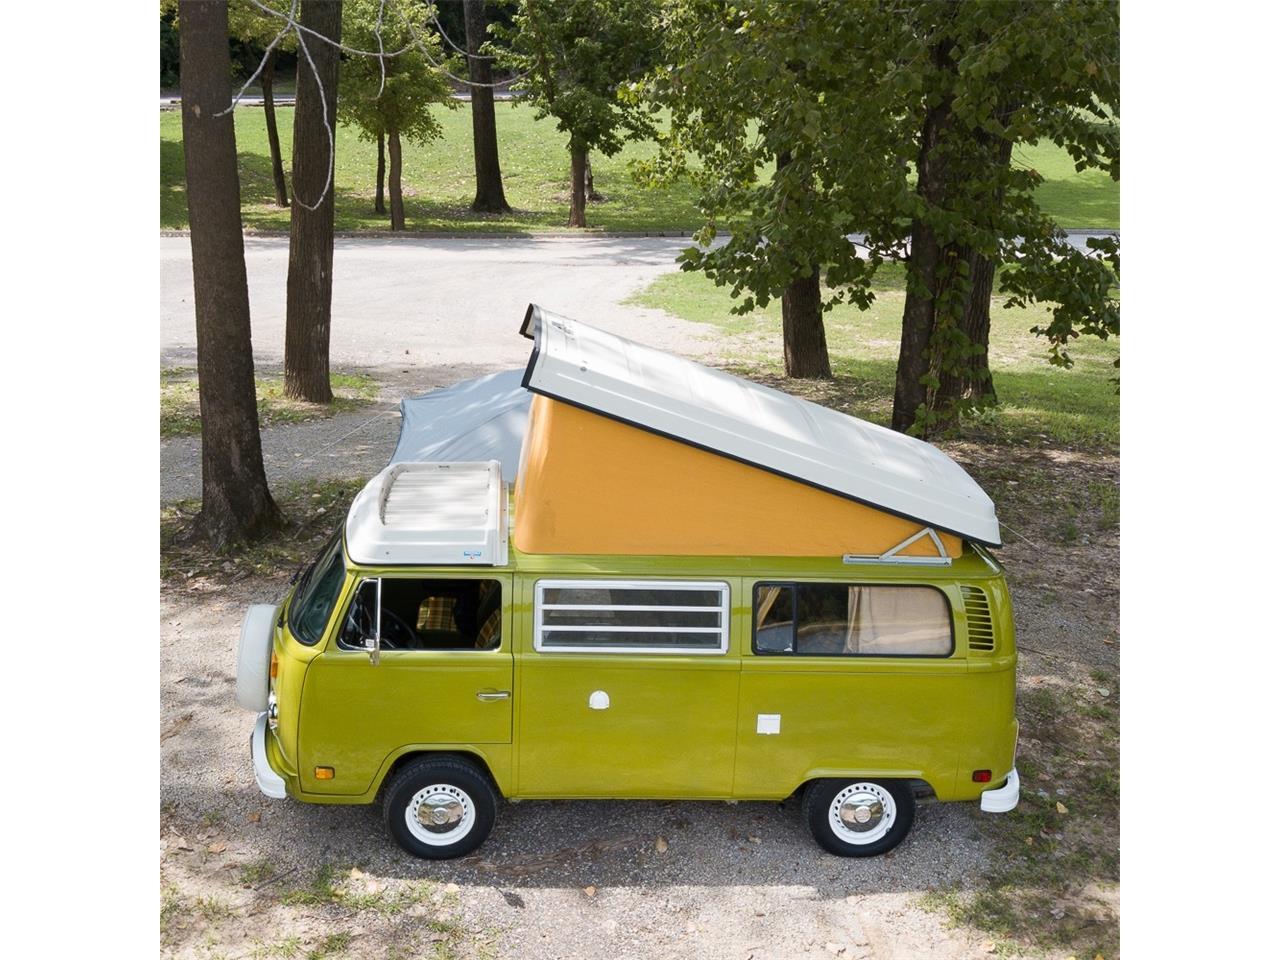 1978 Volkswagen Westfalia Camper For Sale In St Louis Mo Classiccarsbay Com